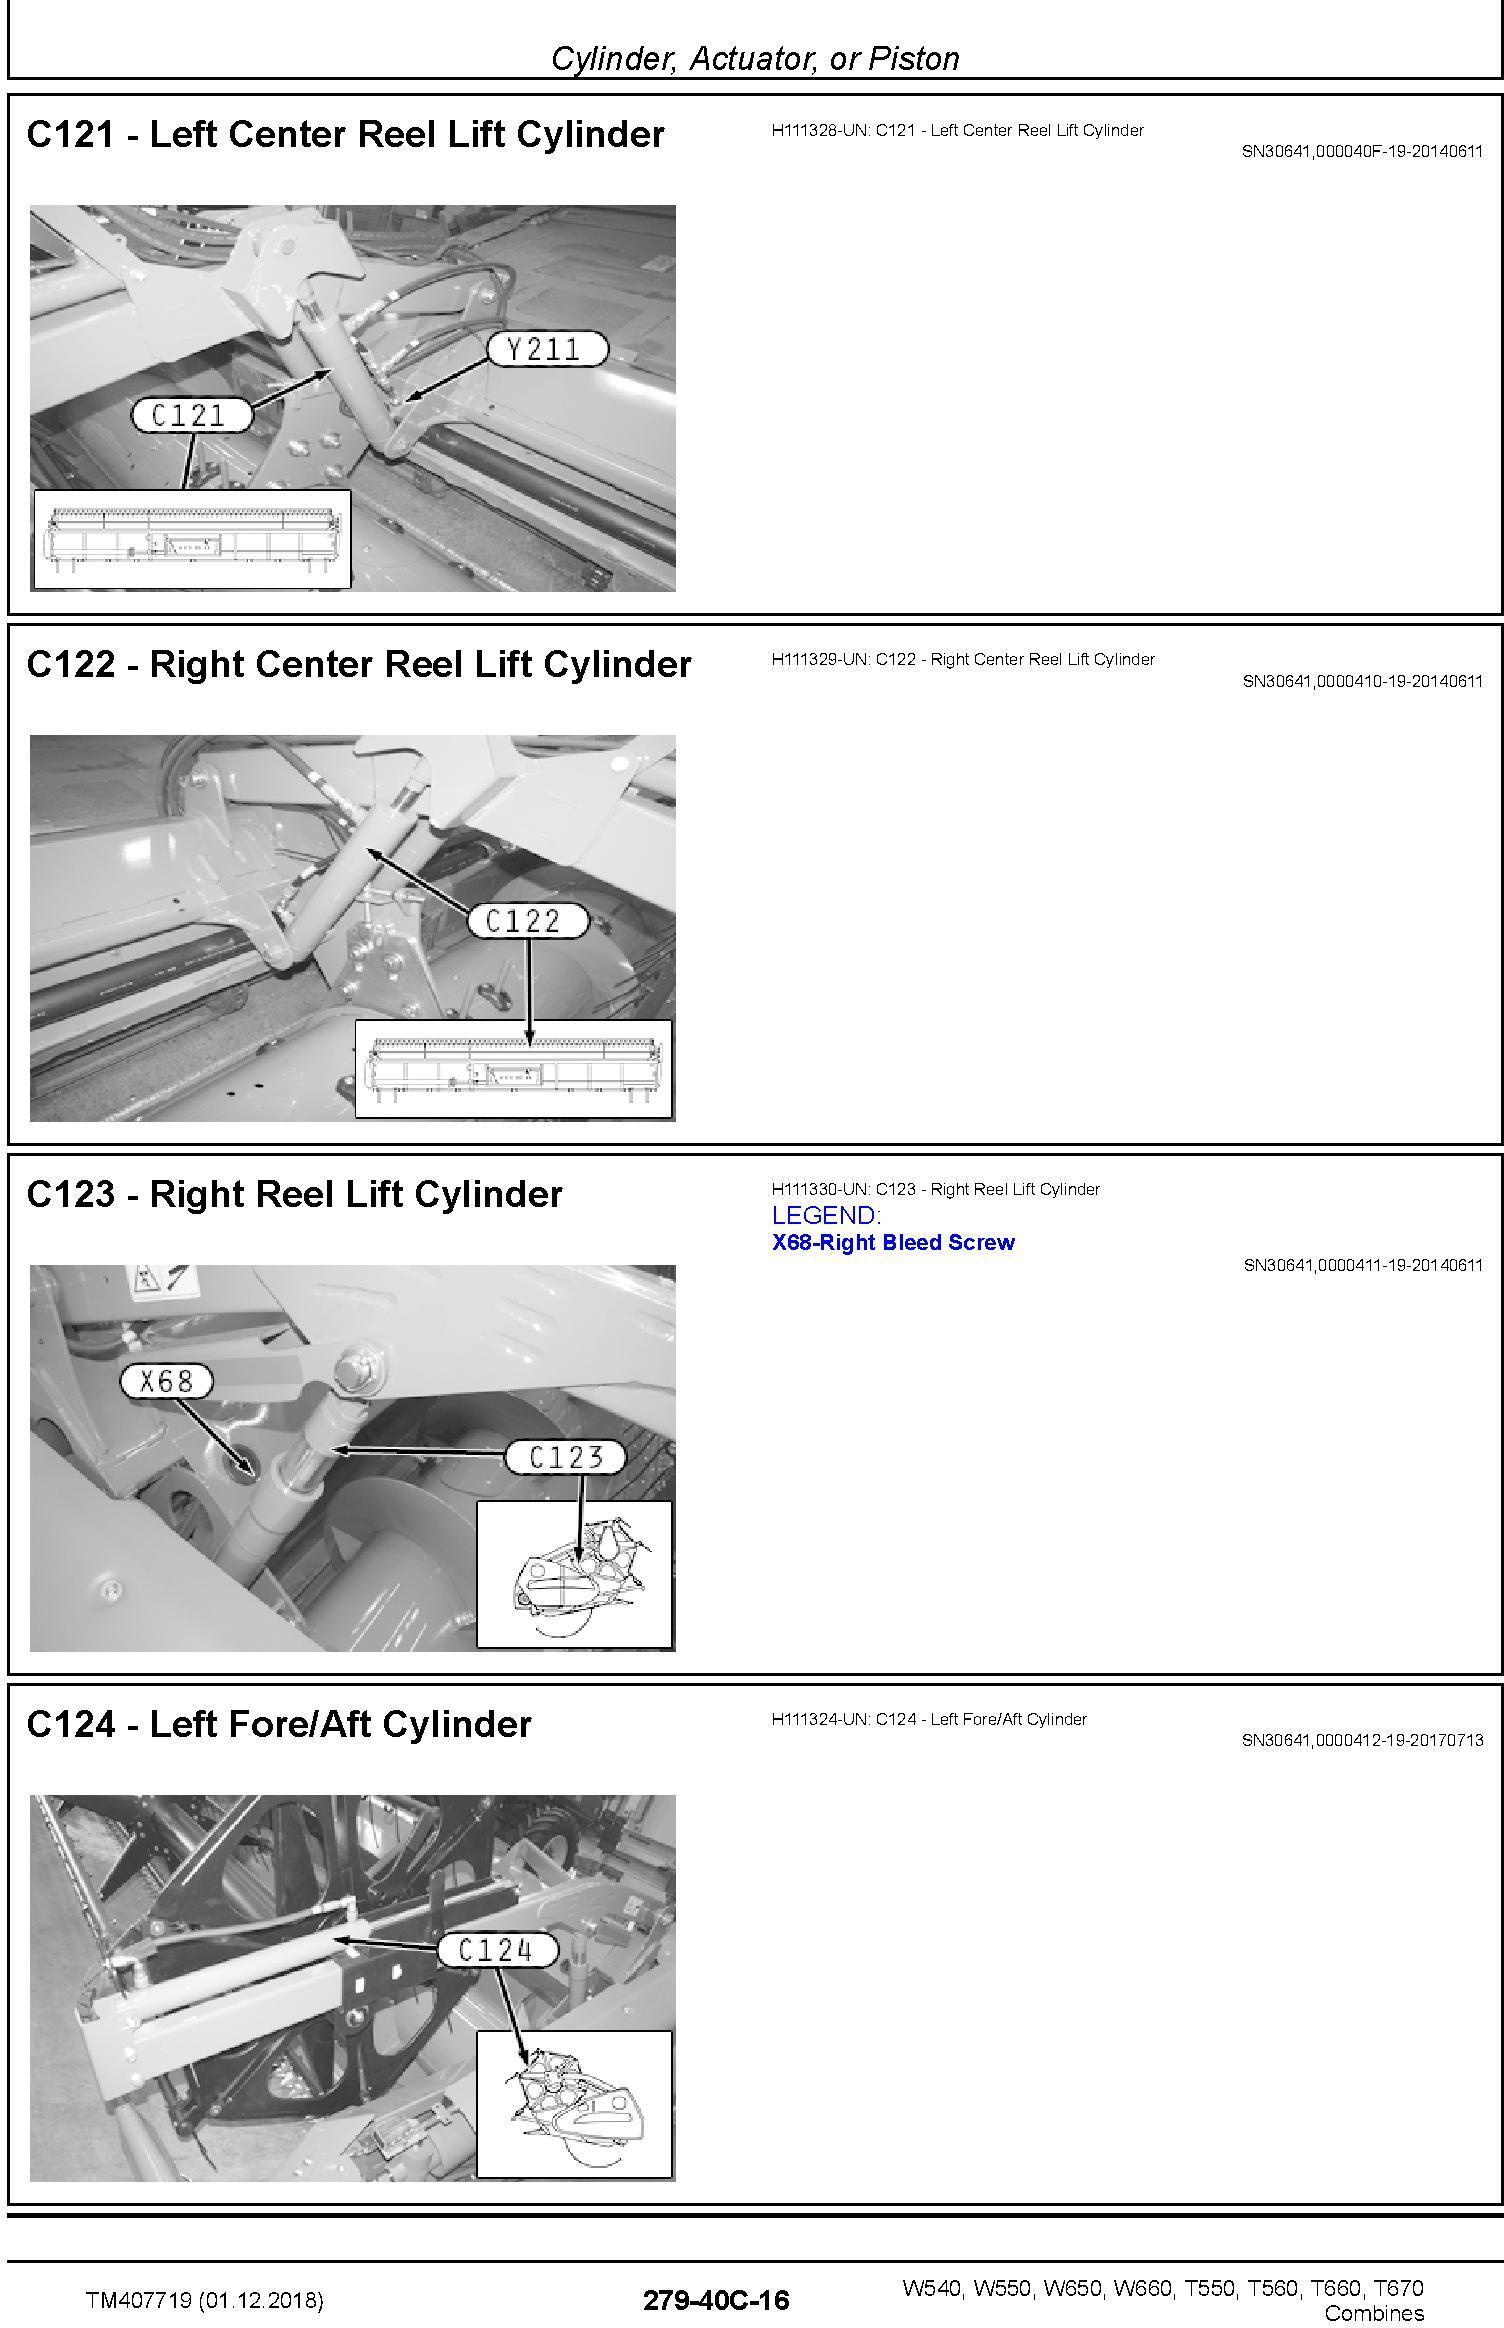 John Deere W540 W550 W650 W660, T550 T560 T660 T670 Combines Diagnostic Technical Manual (TM407719) - 2